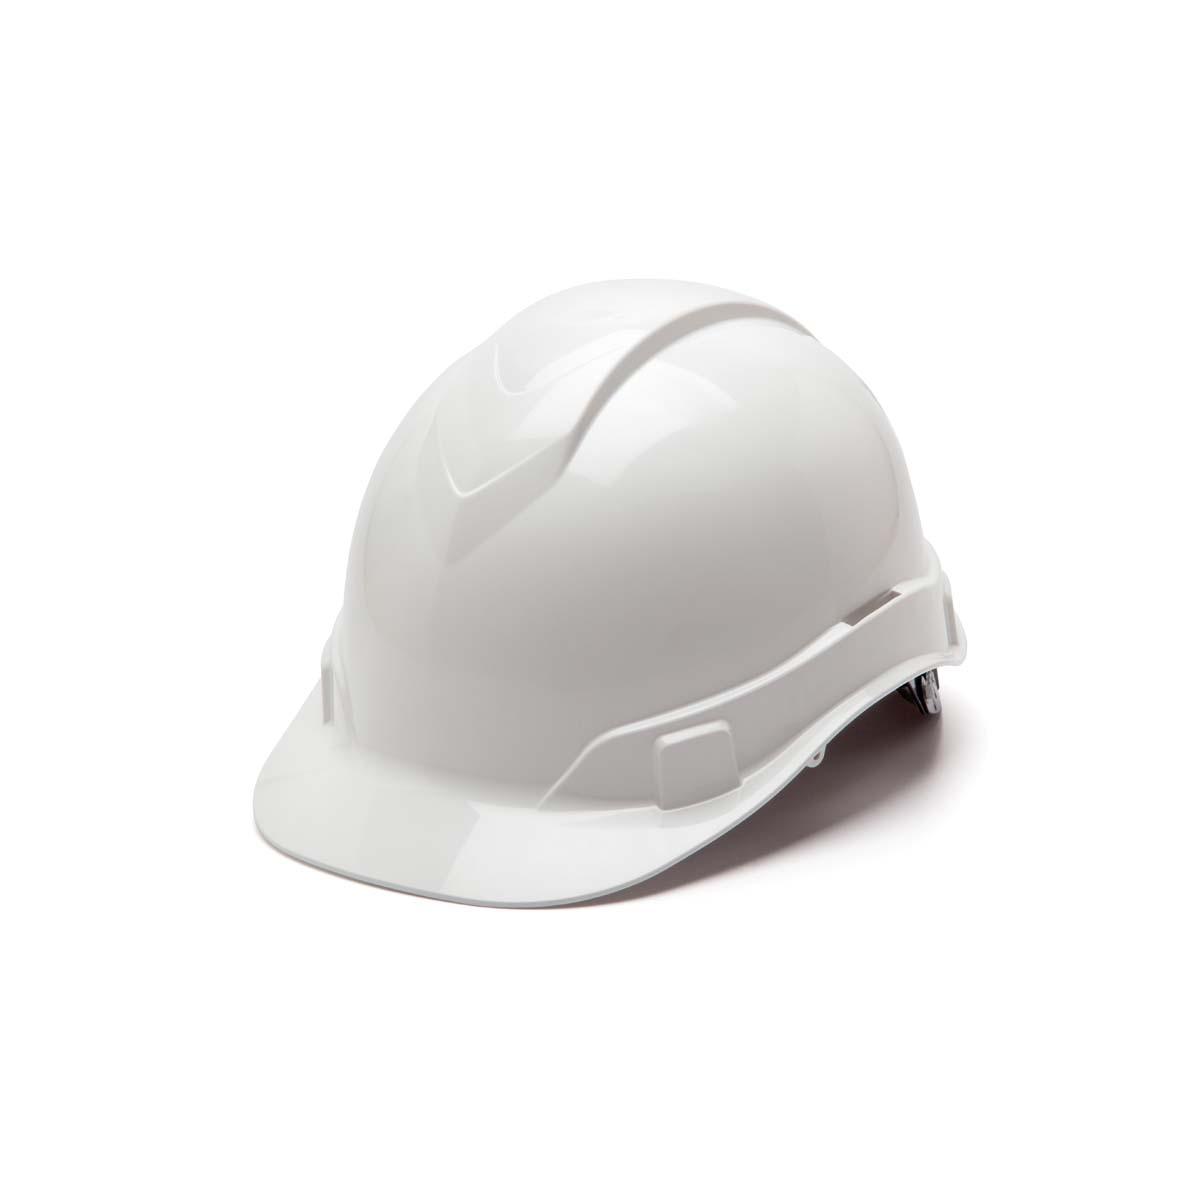 White-Ridgeline Cap Style 4 Pt Ratchet Suspension